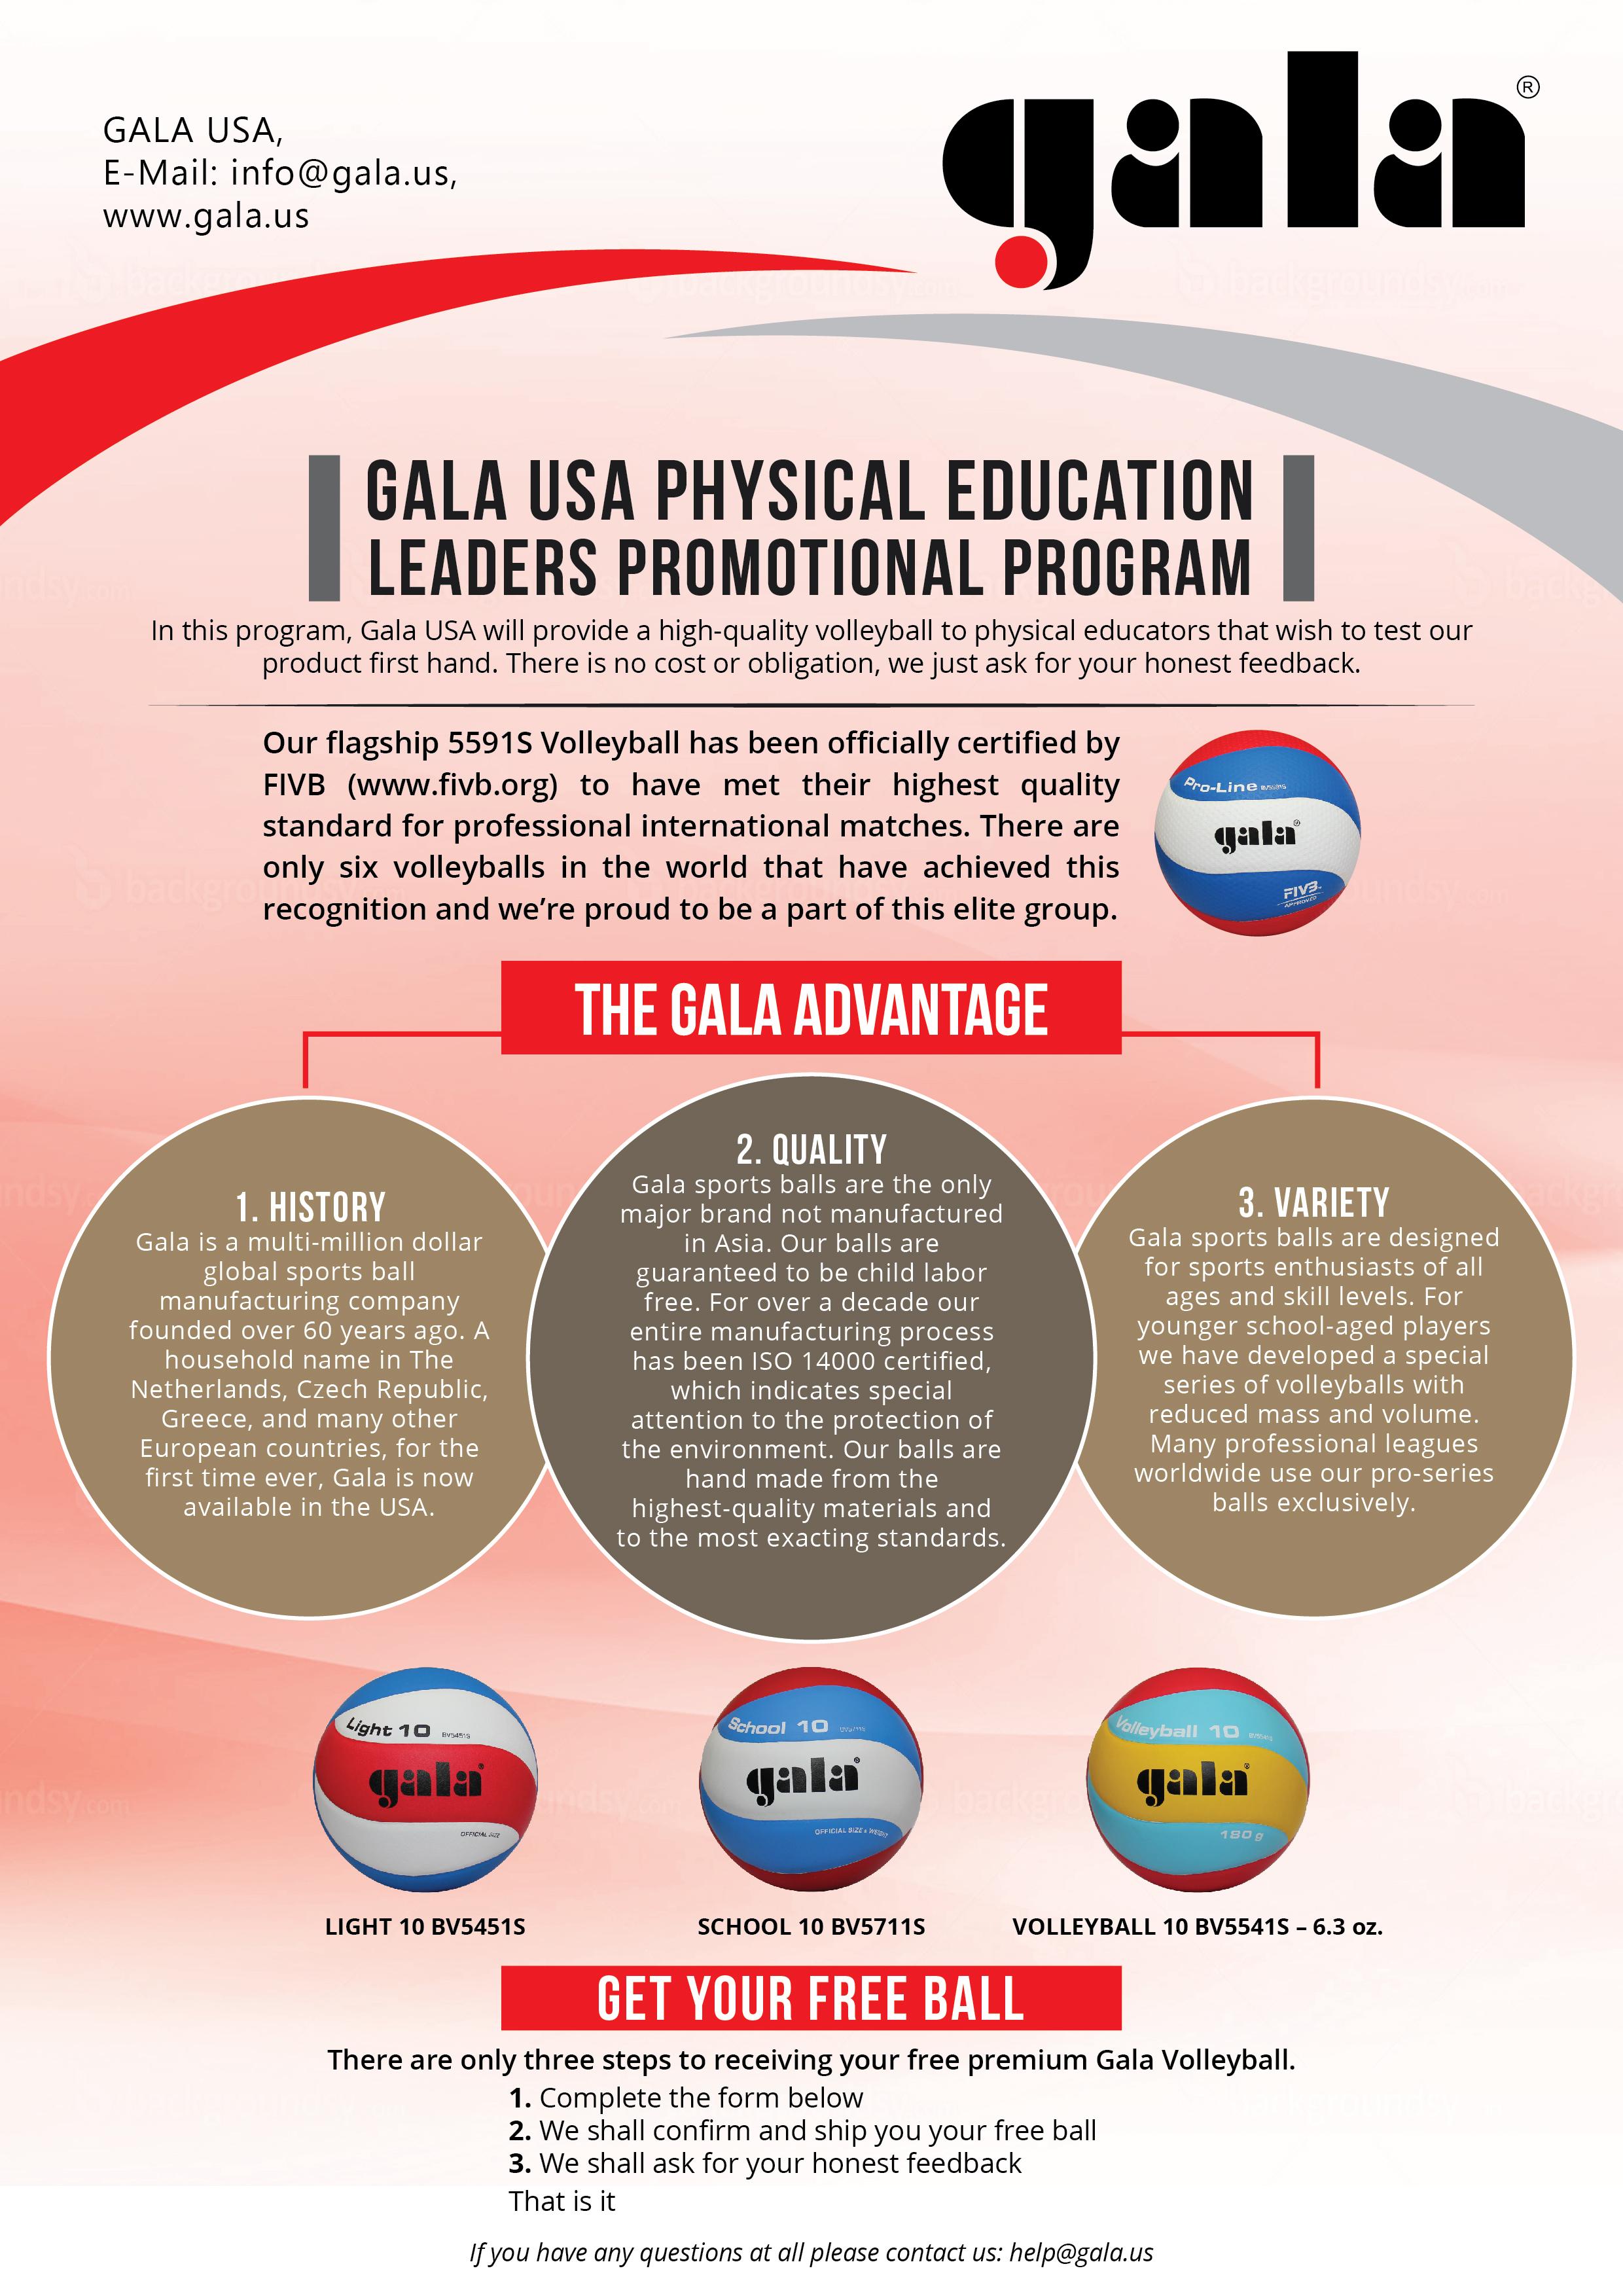 GALA_Promotional_Program_Flyer_1